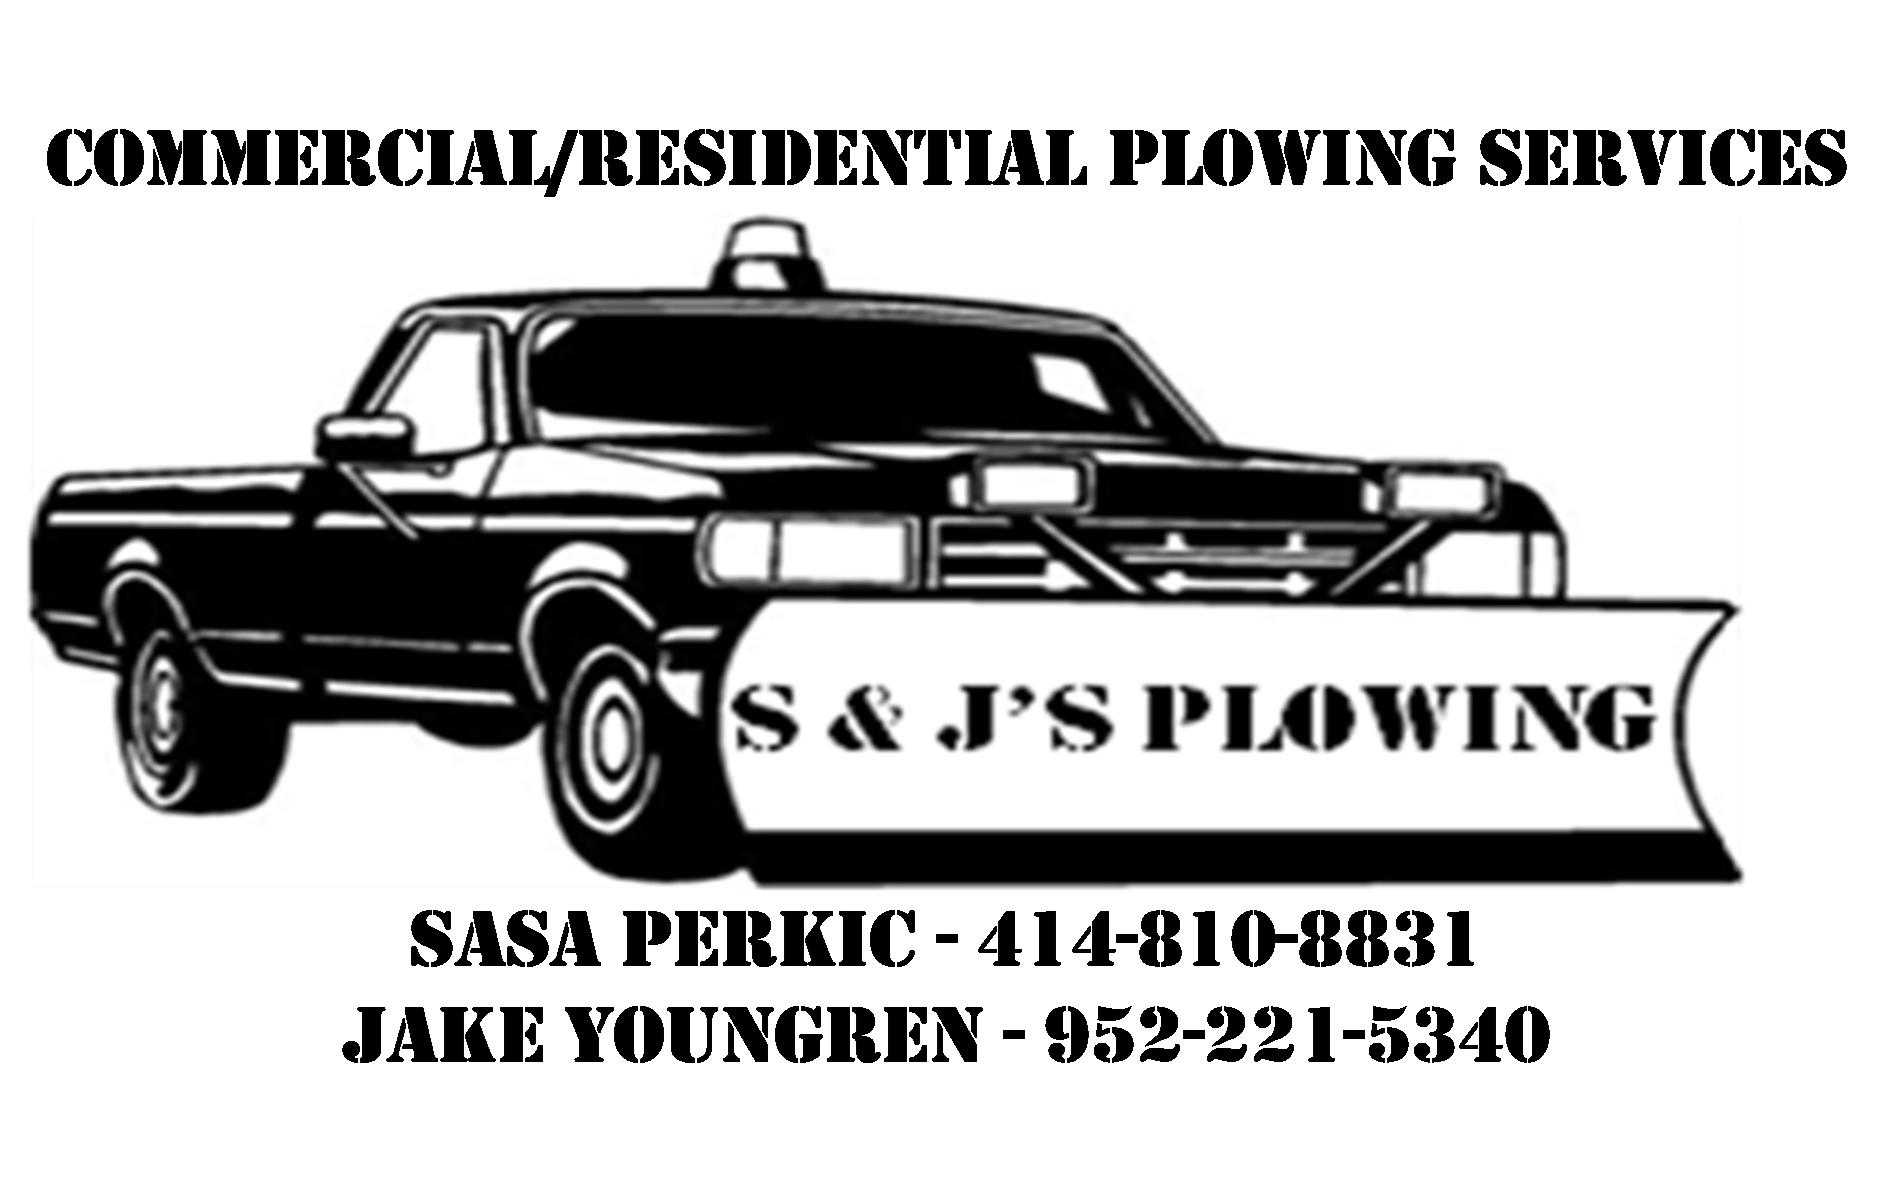 S Amp J S Plowing Llc